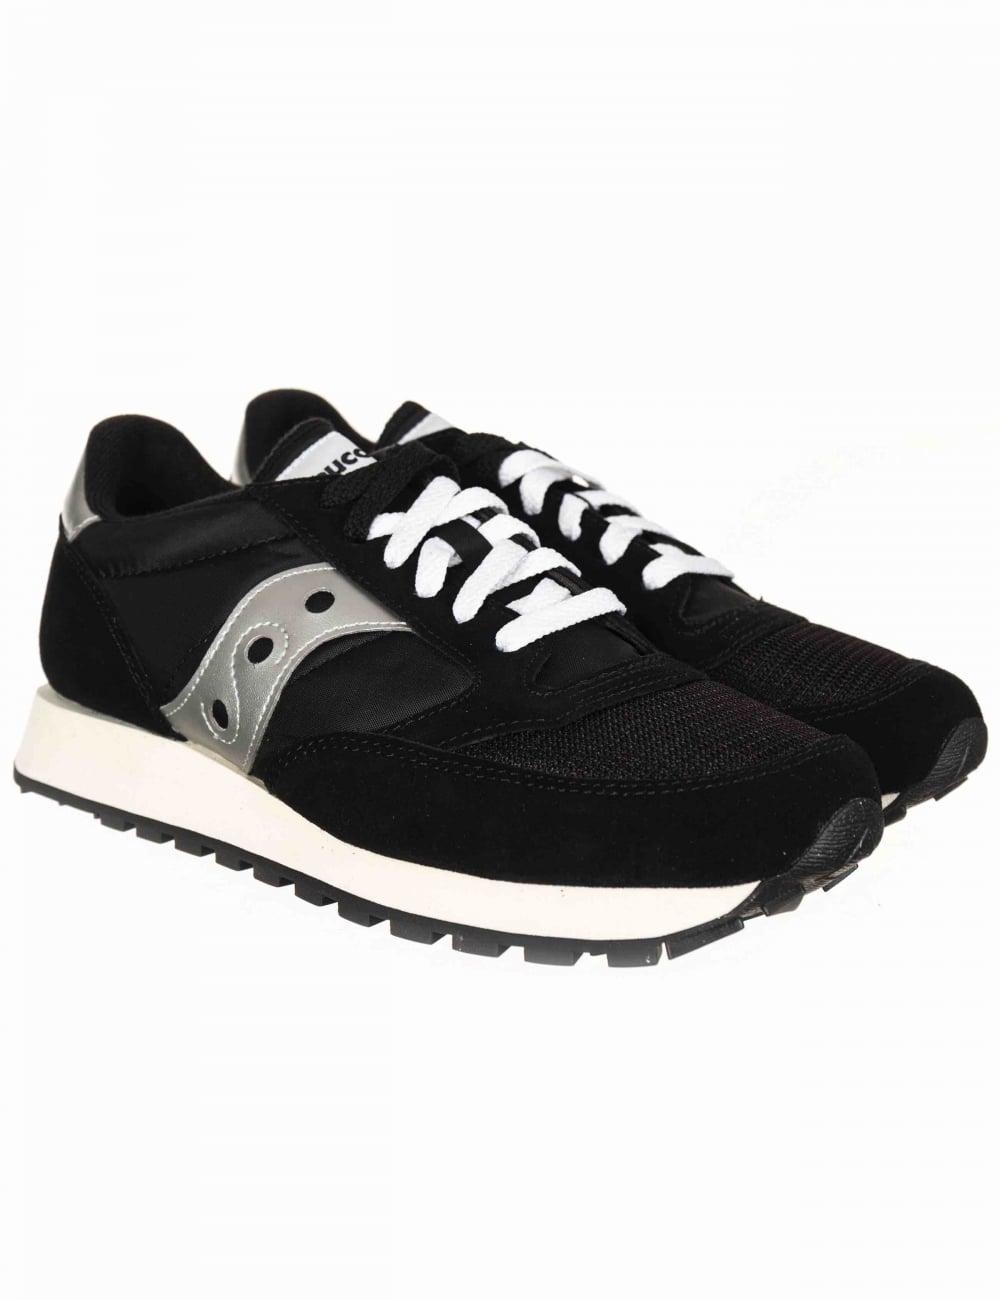 separation shoes 9d6e4 93fce Jazz Vintage OG Trainers - Black/White